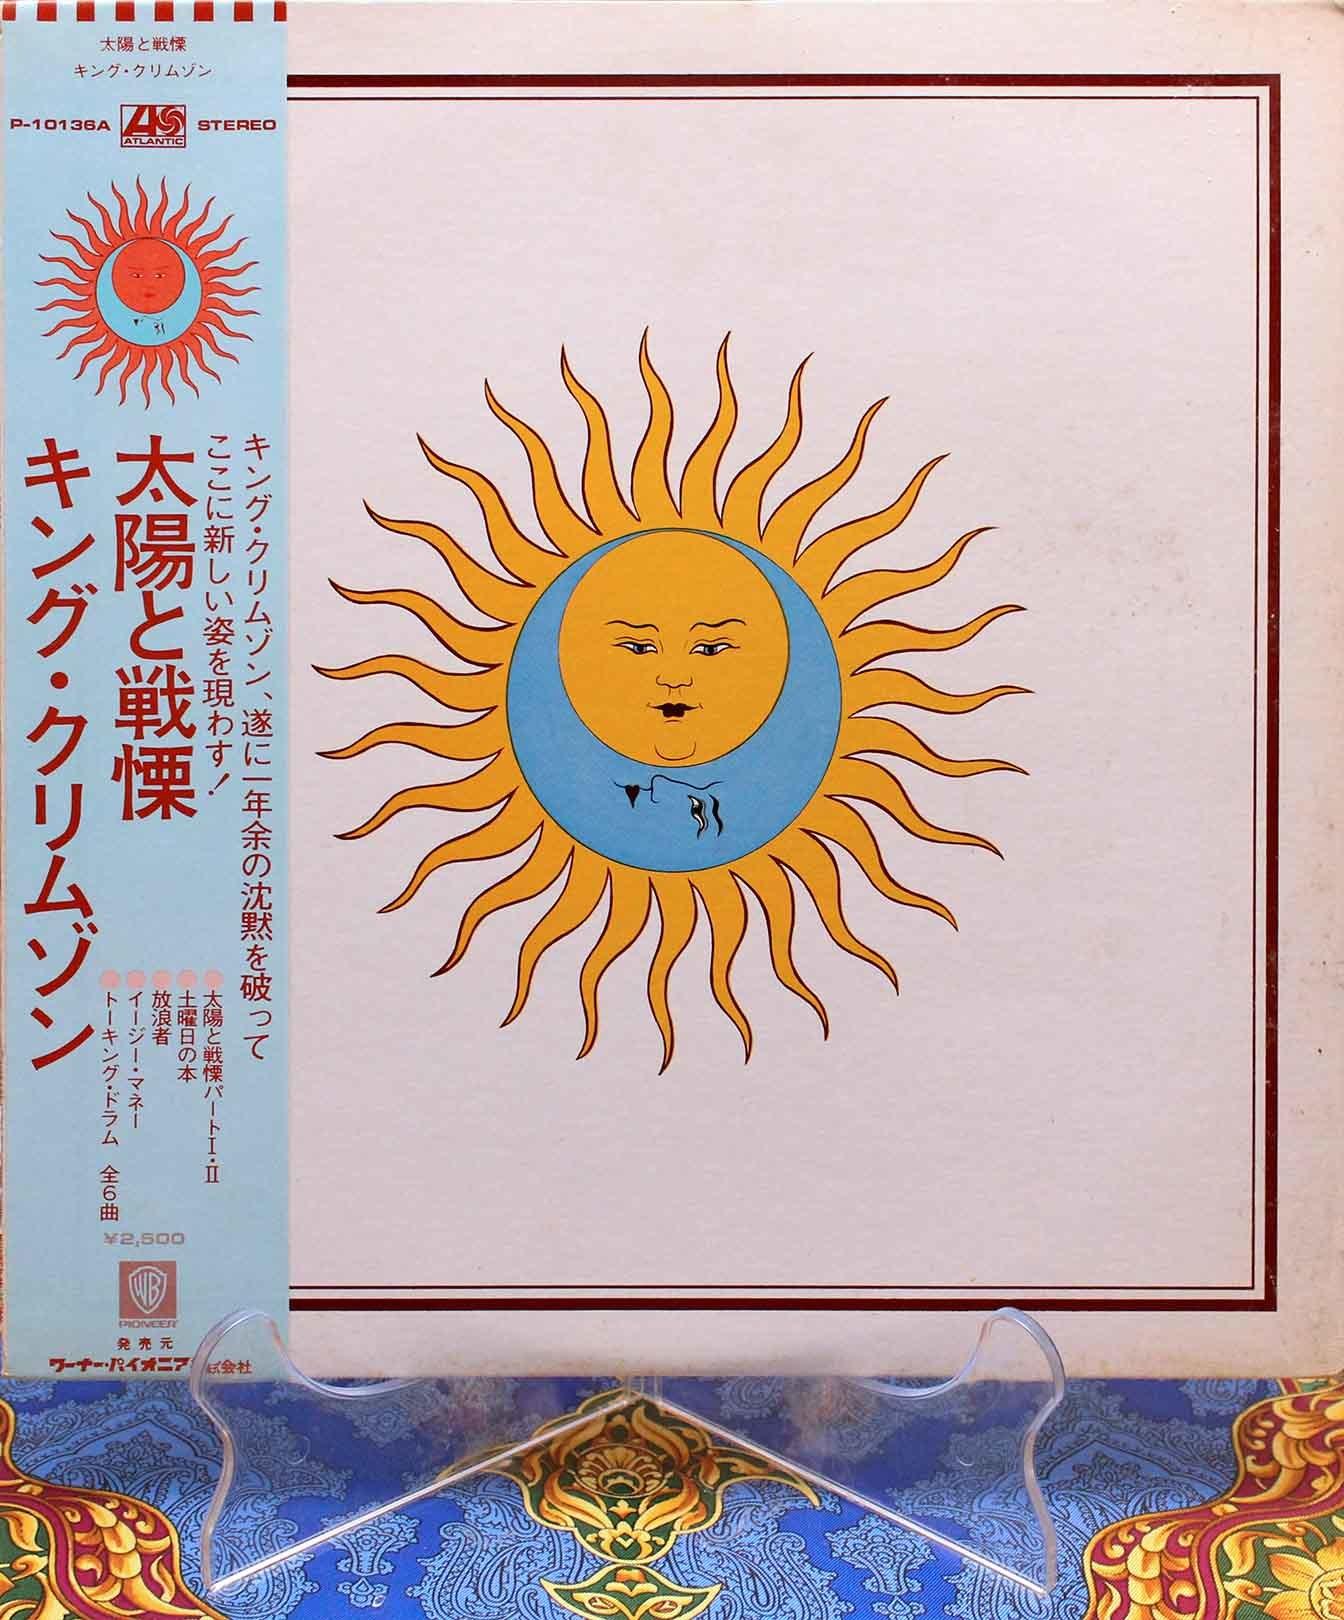 King Crimson – Larks Tongues In Aspic 01